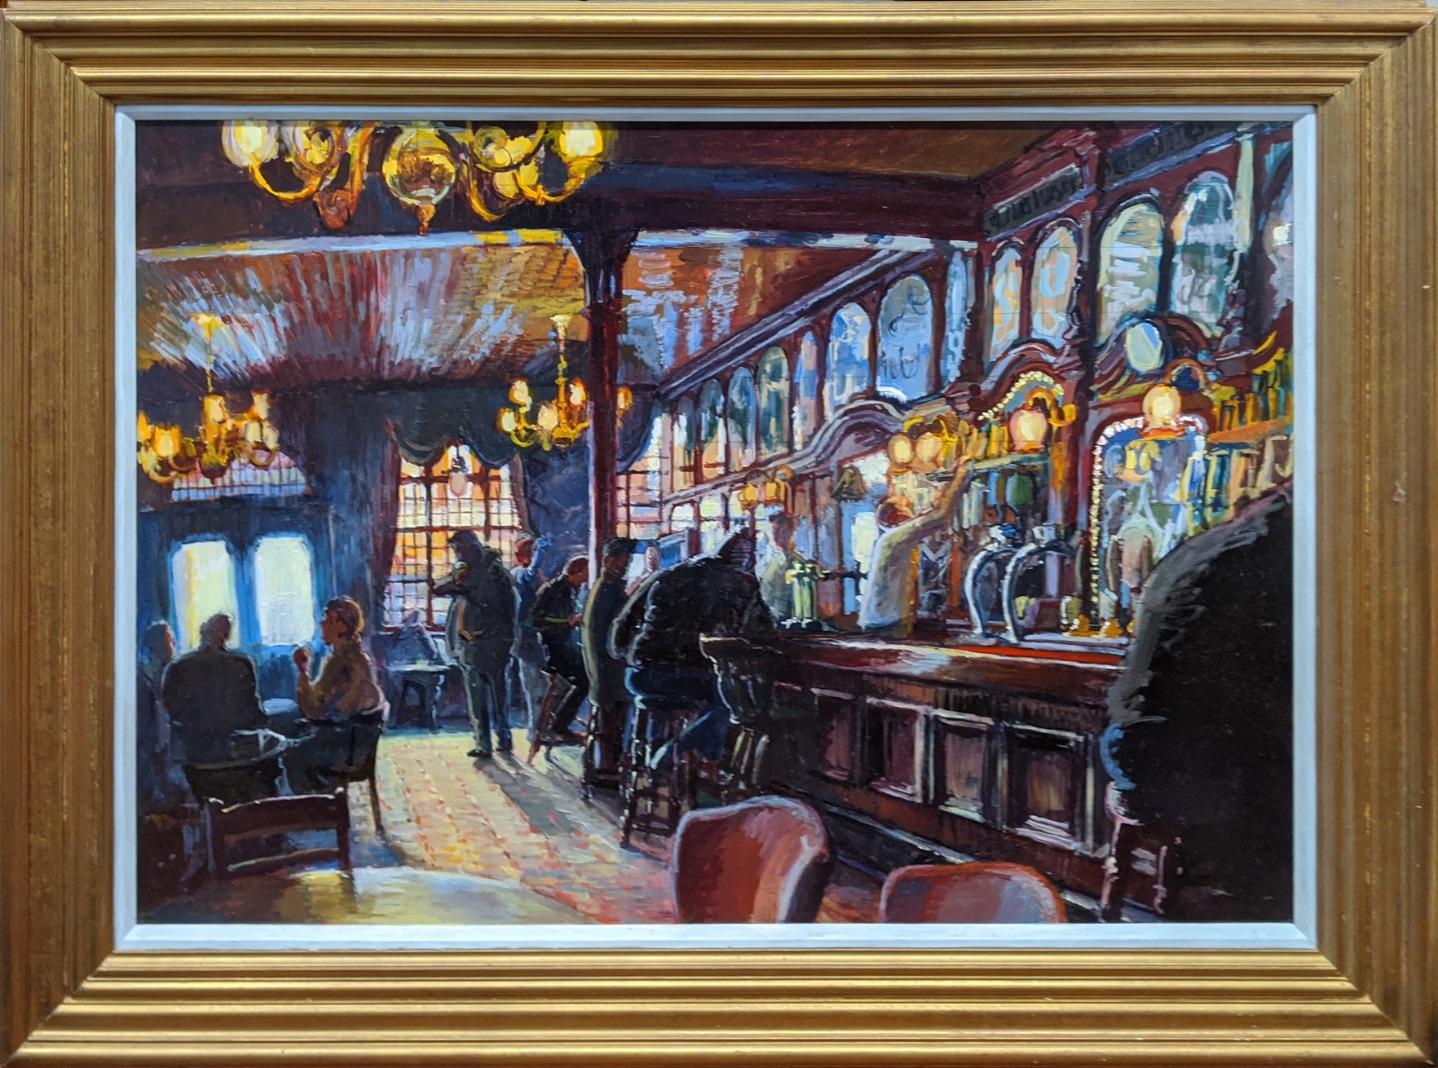 Gary Jeffrey (Contemporary British), The Spread Eagle Pub, Wandsworth, oil on board, H.66cm W.86.5cm - Image 3 of 3